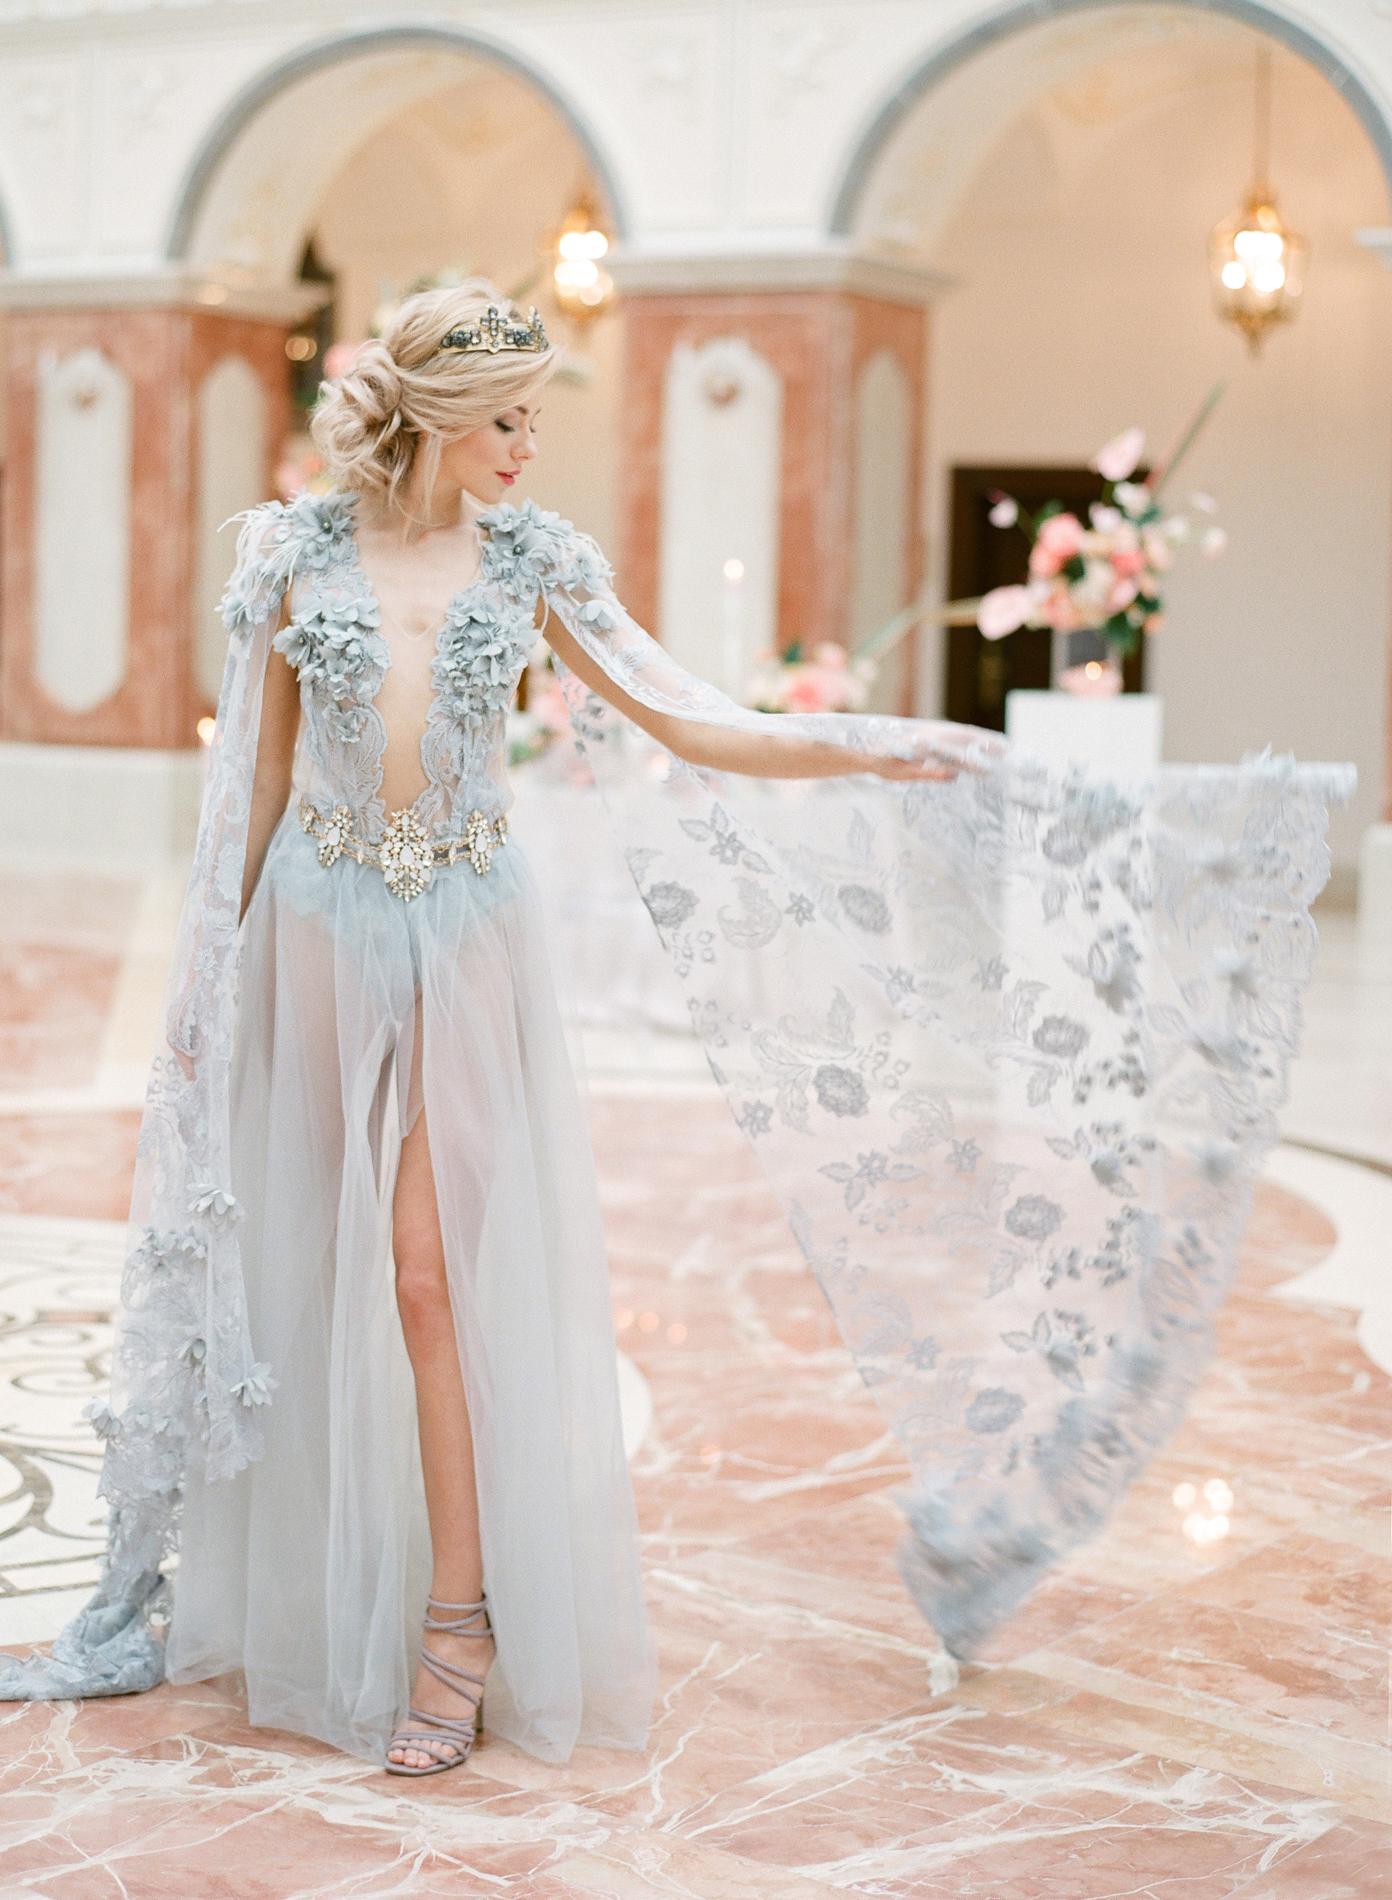 galicia_nueva_wedding_photographer_nikol_bodnarova_italy_wedding_photographer_86.JPG